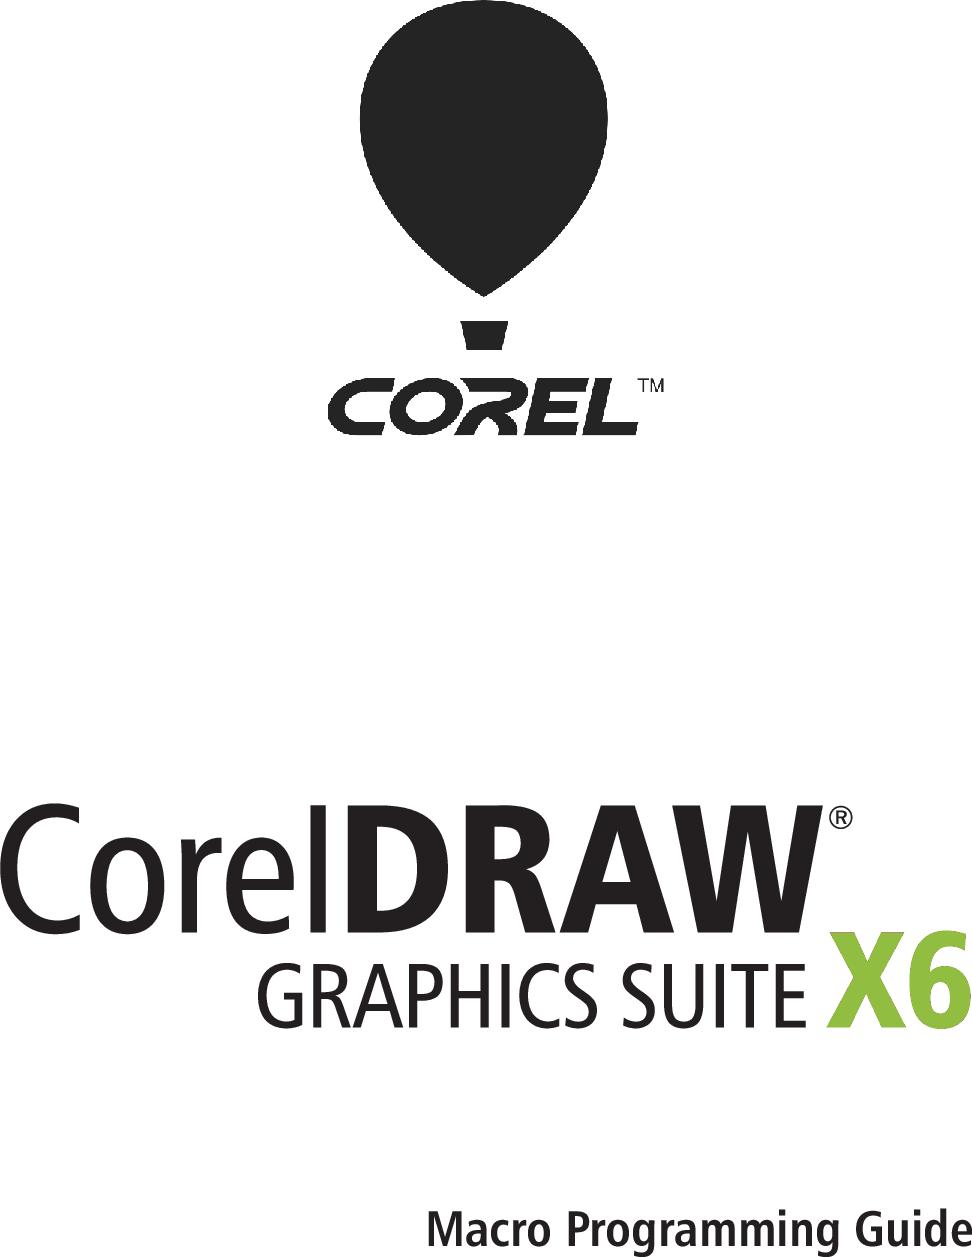 Corel CorelDRAW(R) Graphics Suite X6 Macro Programming Guide